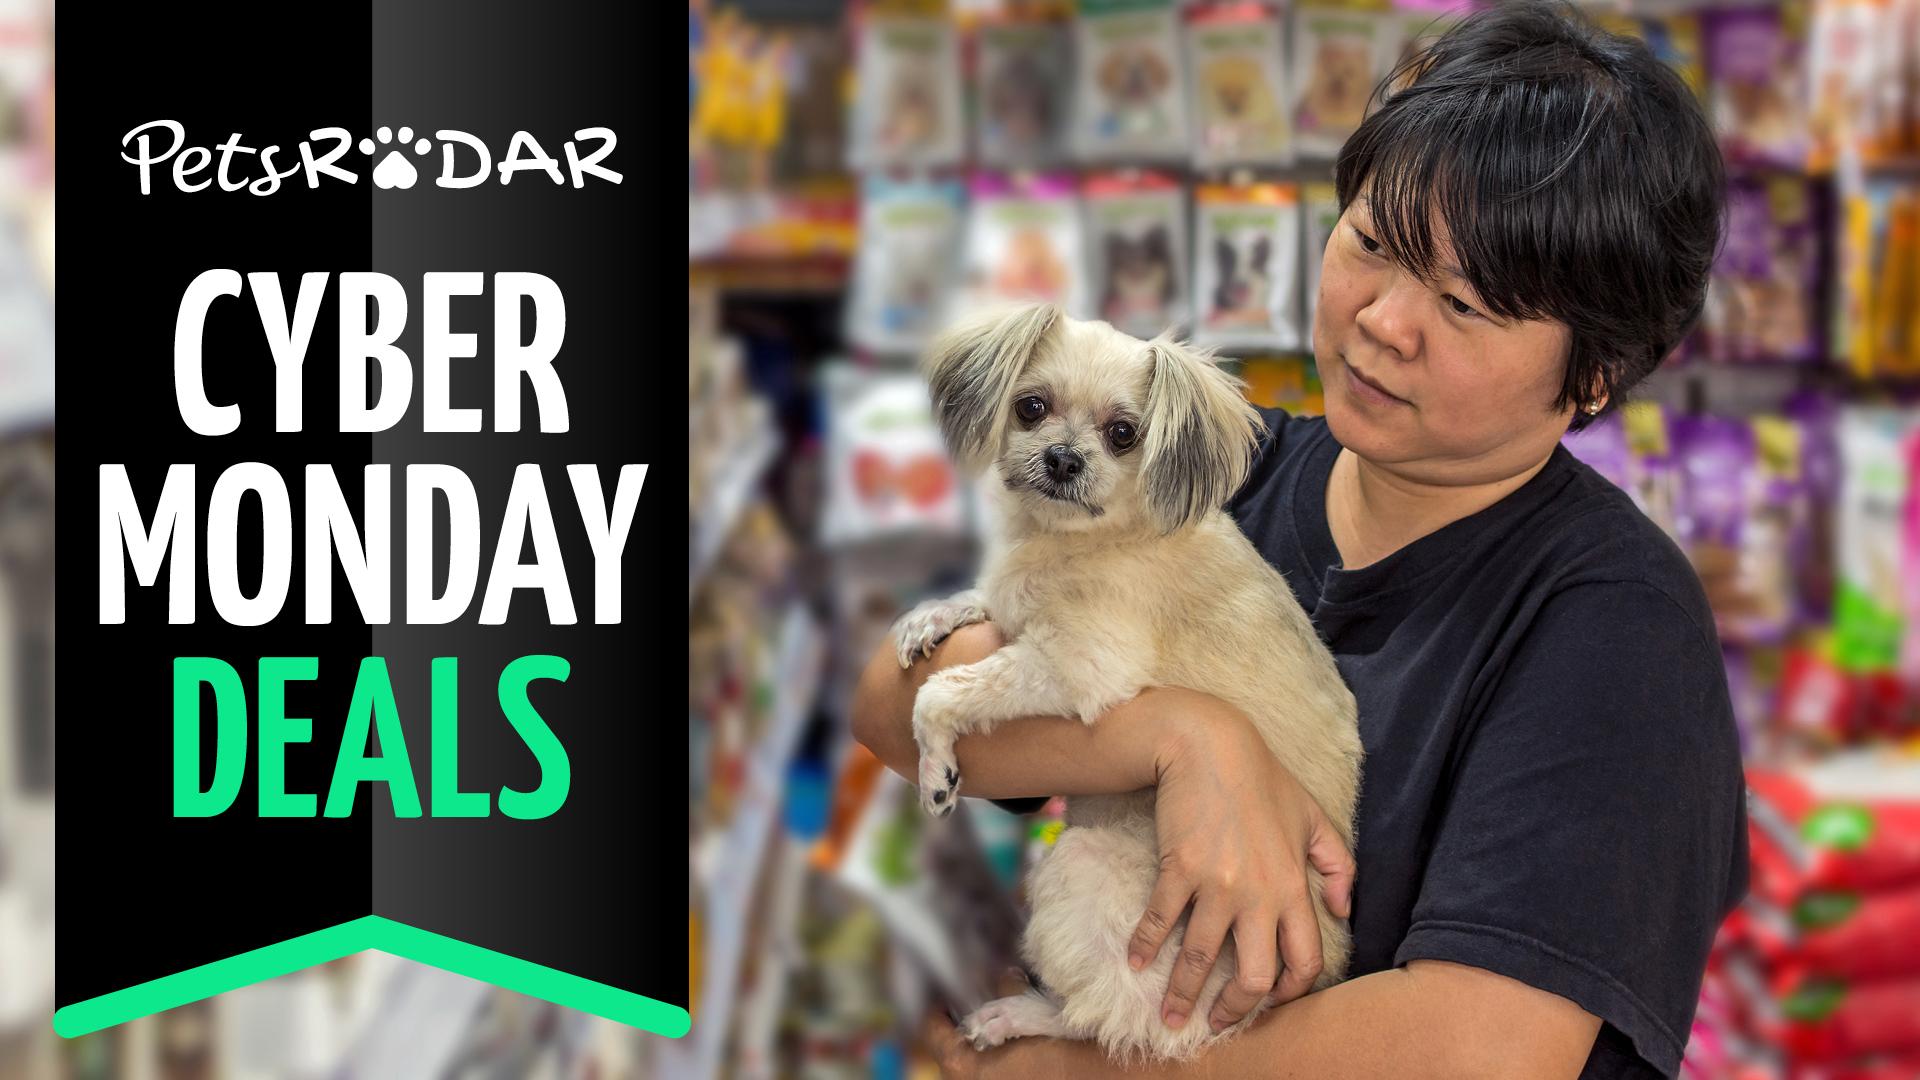 Get The Best Cyber Monday Pet Deals Petsmart Walmart Petco And More Petsradar